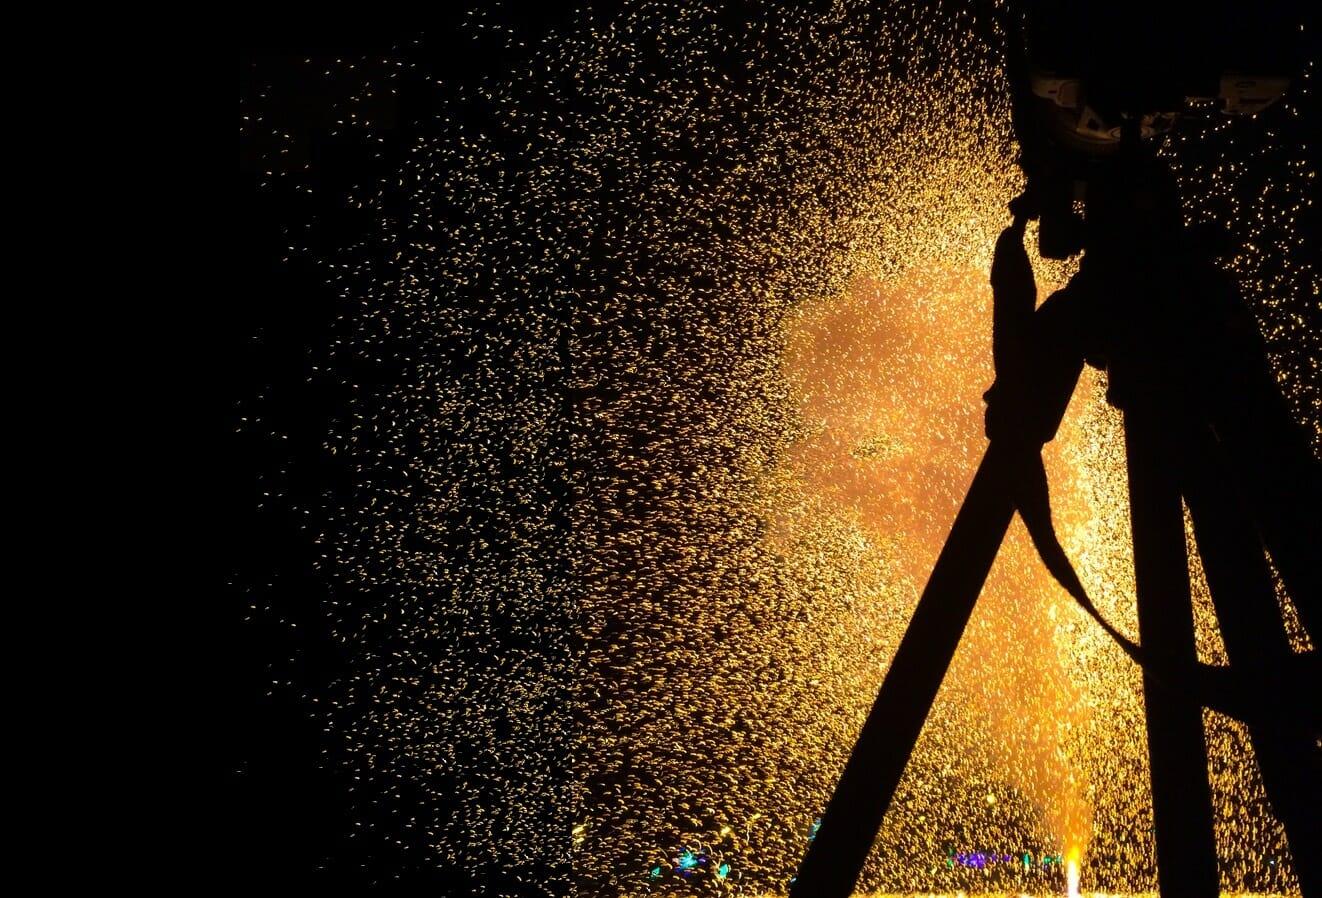 firework explosion camera tripod yellow orange